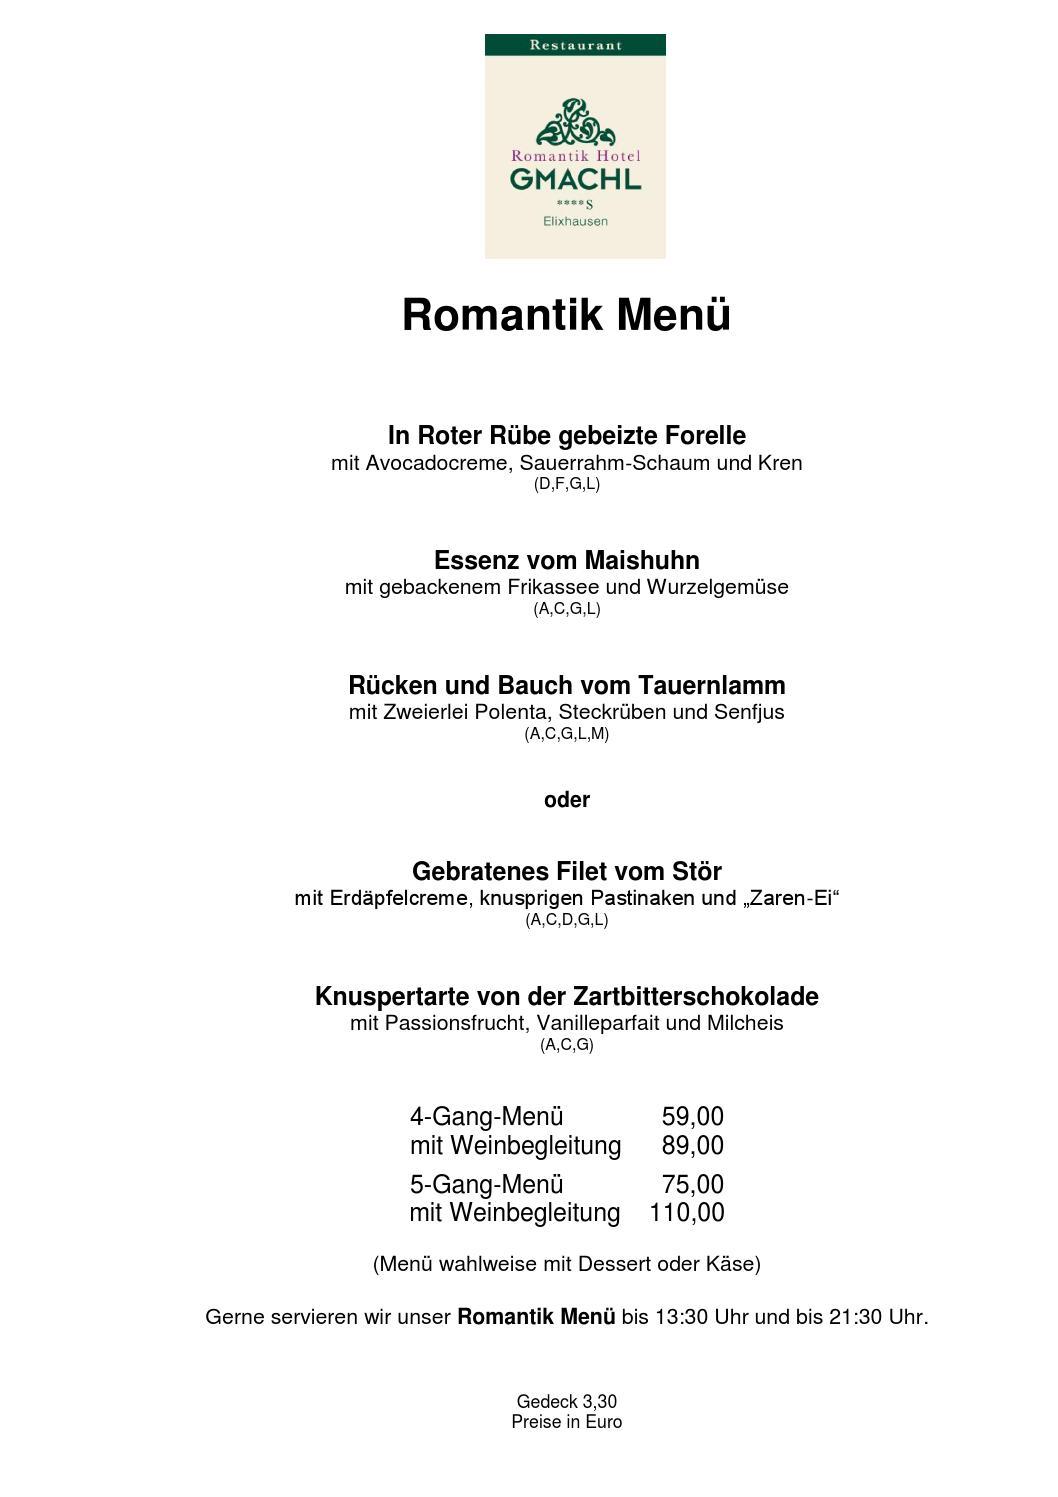 speisekarte restaurant gmachl elixhausen by romantik hotel gmachl issuu. Black Bedroom Furniture Sets. Home Design Ideas